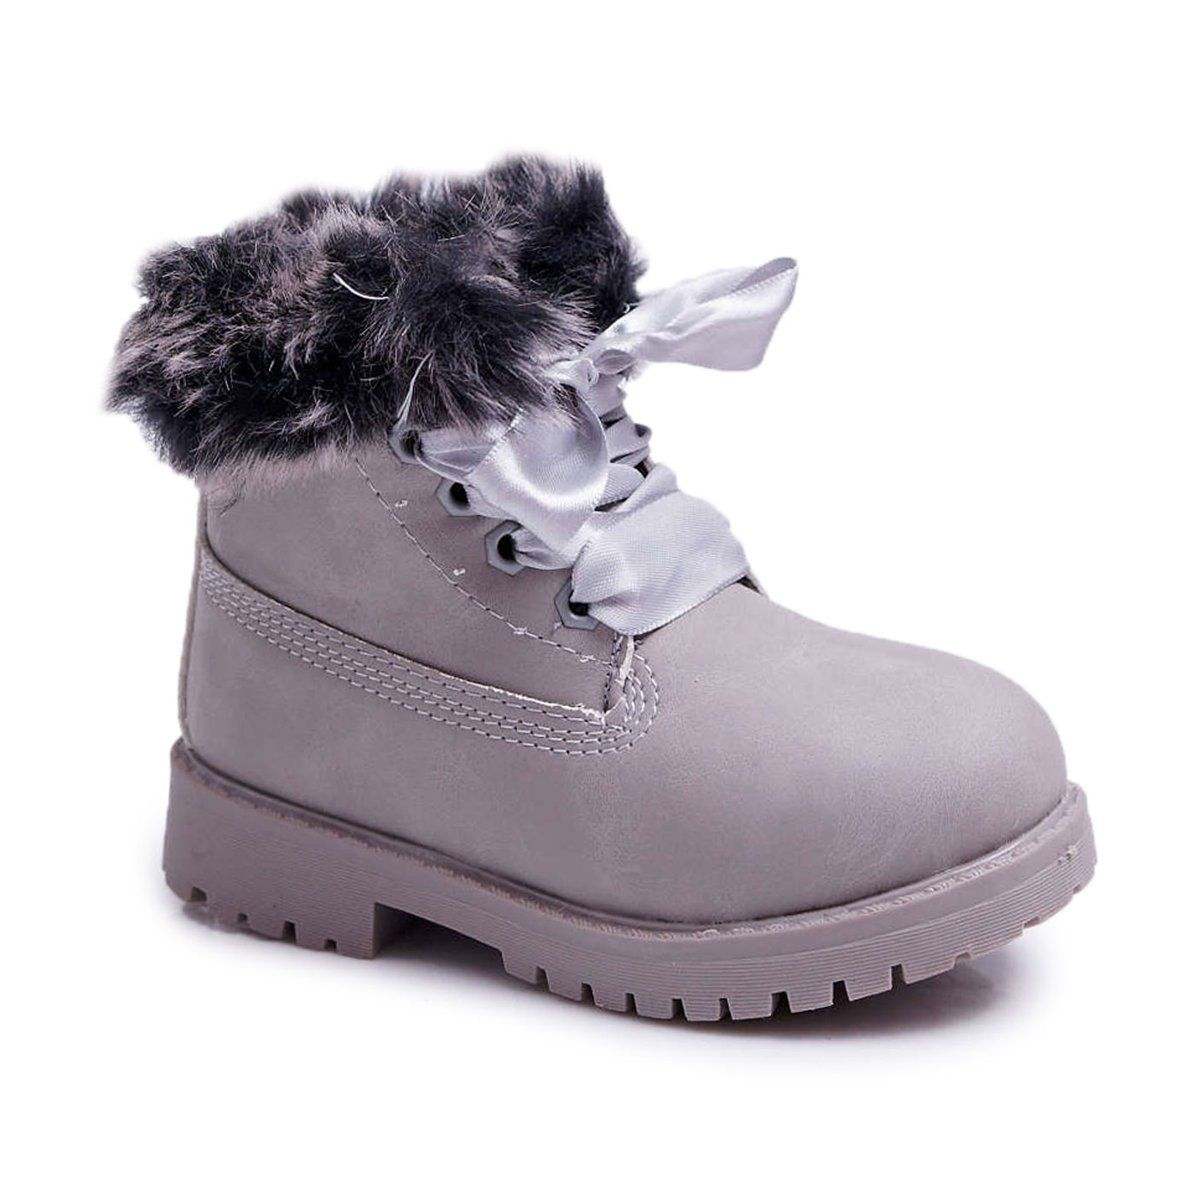 Frrock Dzieciece Botki Ocieplane Futerkiem Trapery Szare Tesoro Timberland Boots Shoes Boots